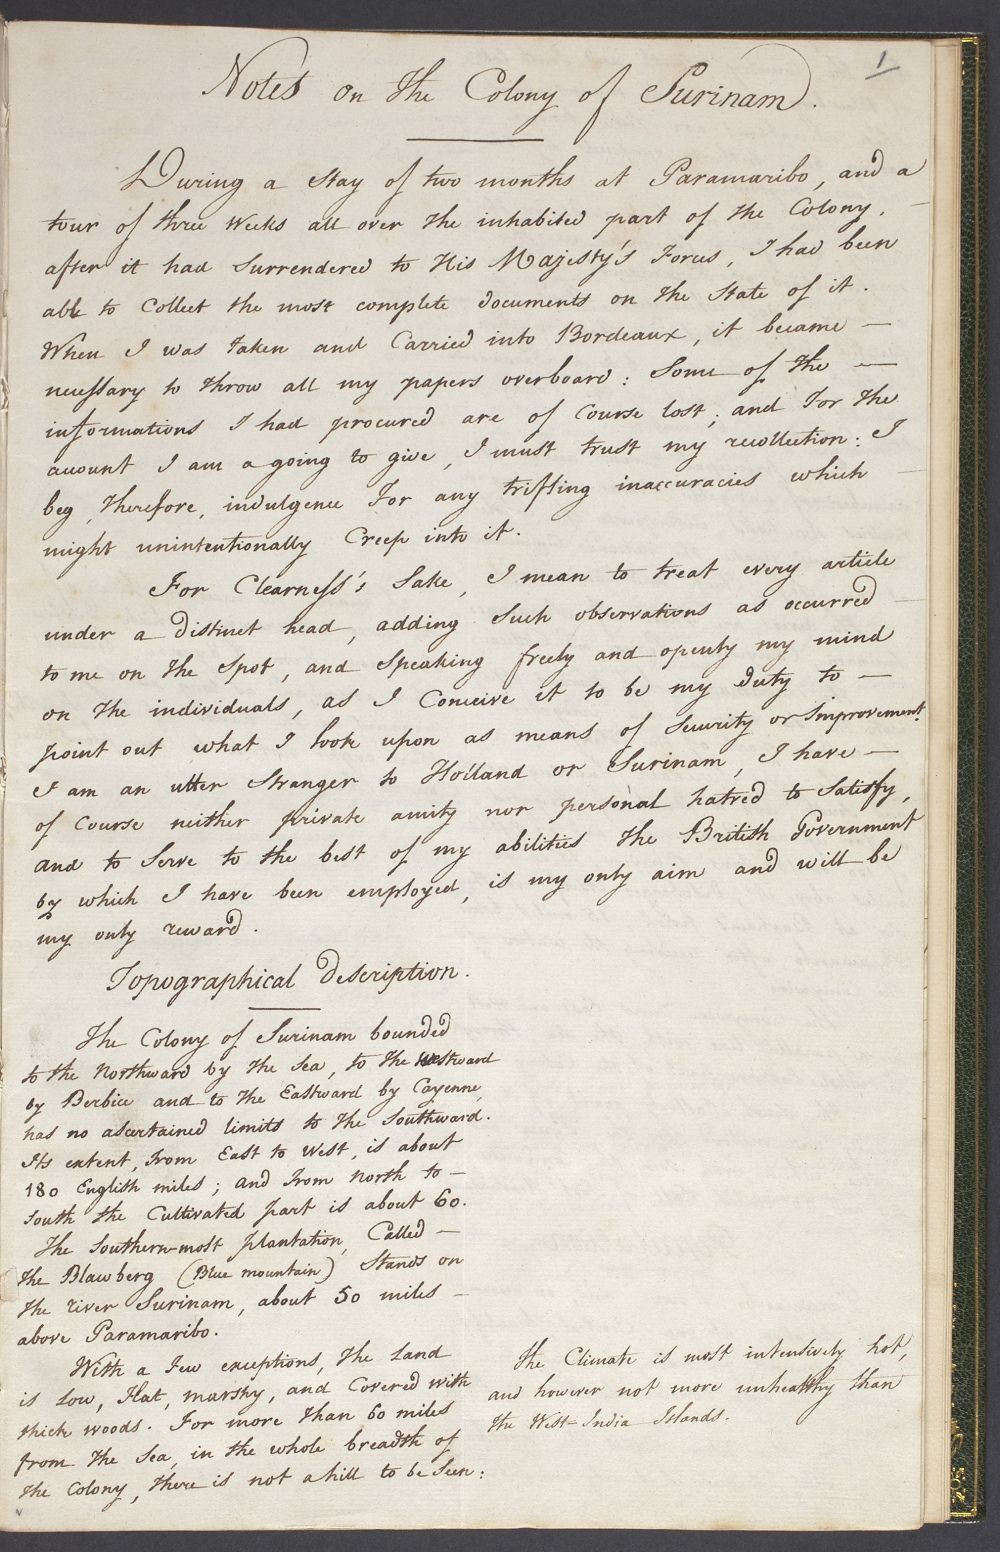 Notes on the colony of Surinam, 1800 - Koninklijke Bibliotheek